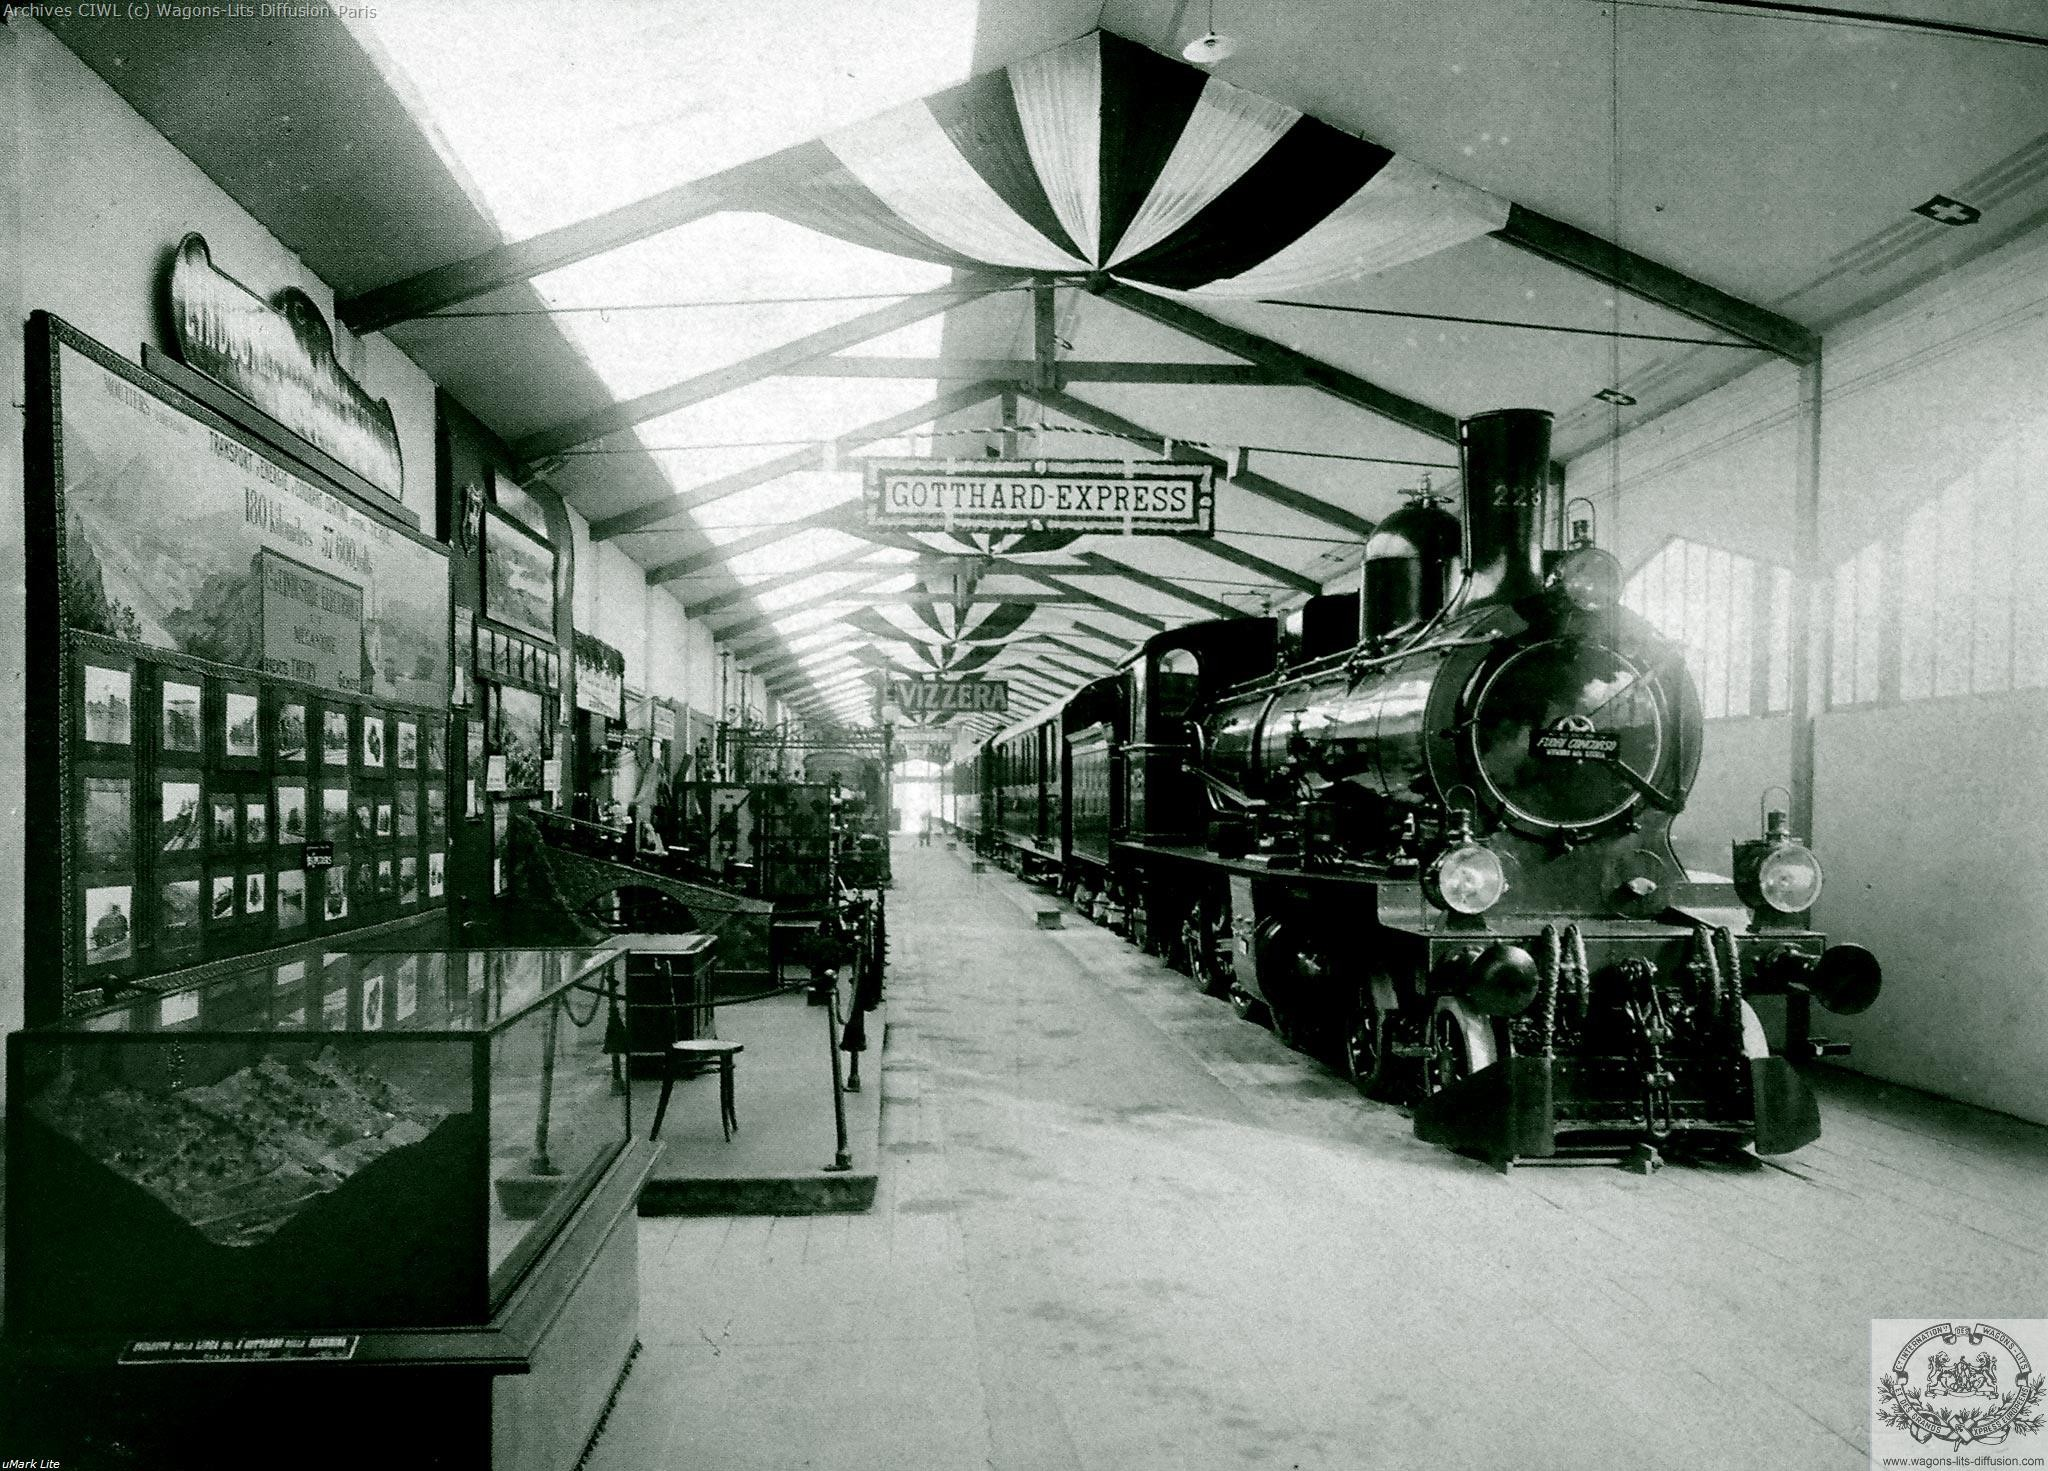 Wl switzerland gotthard express milan expo 1906